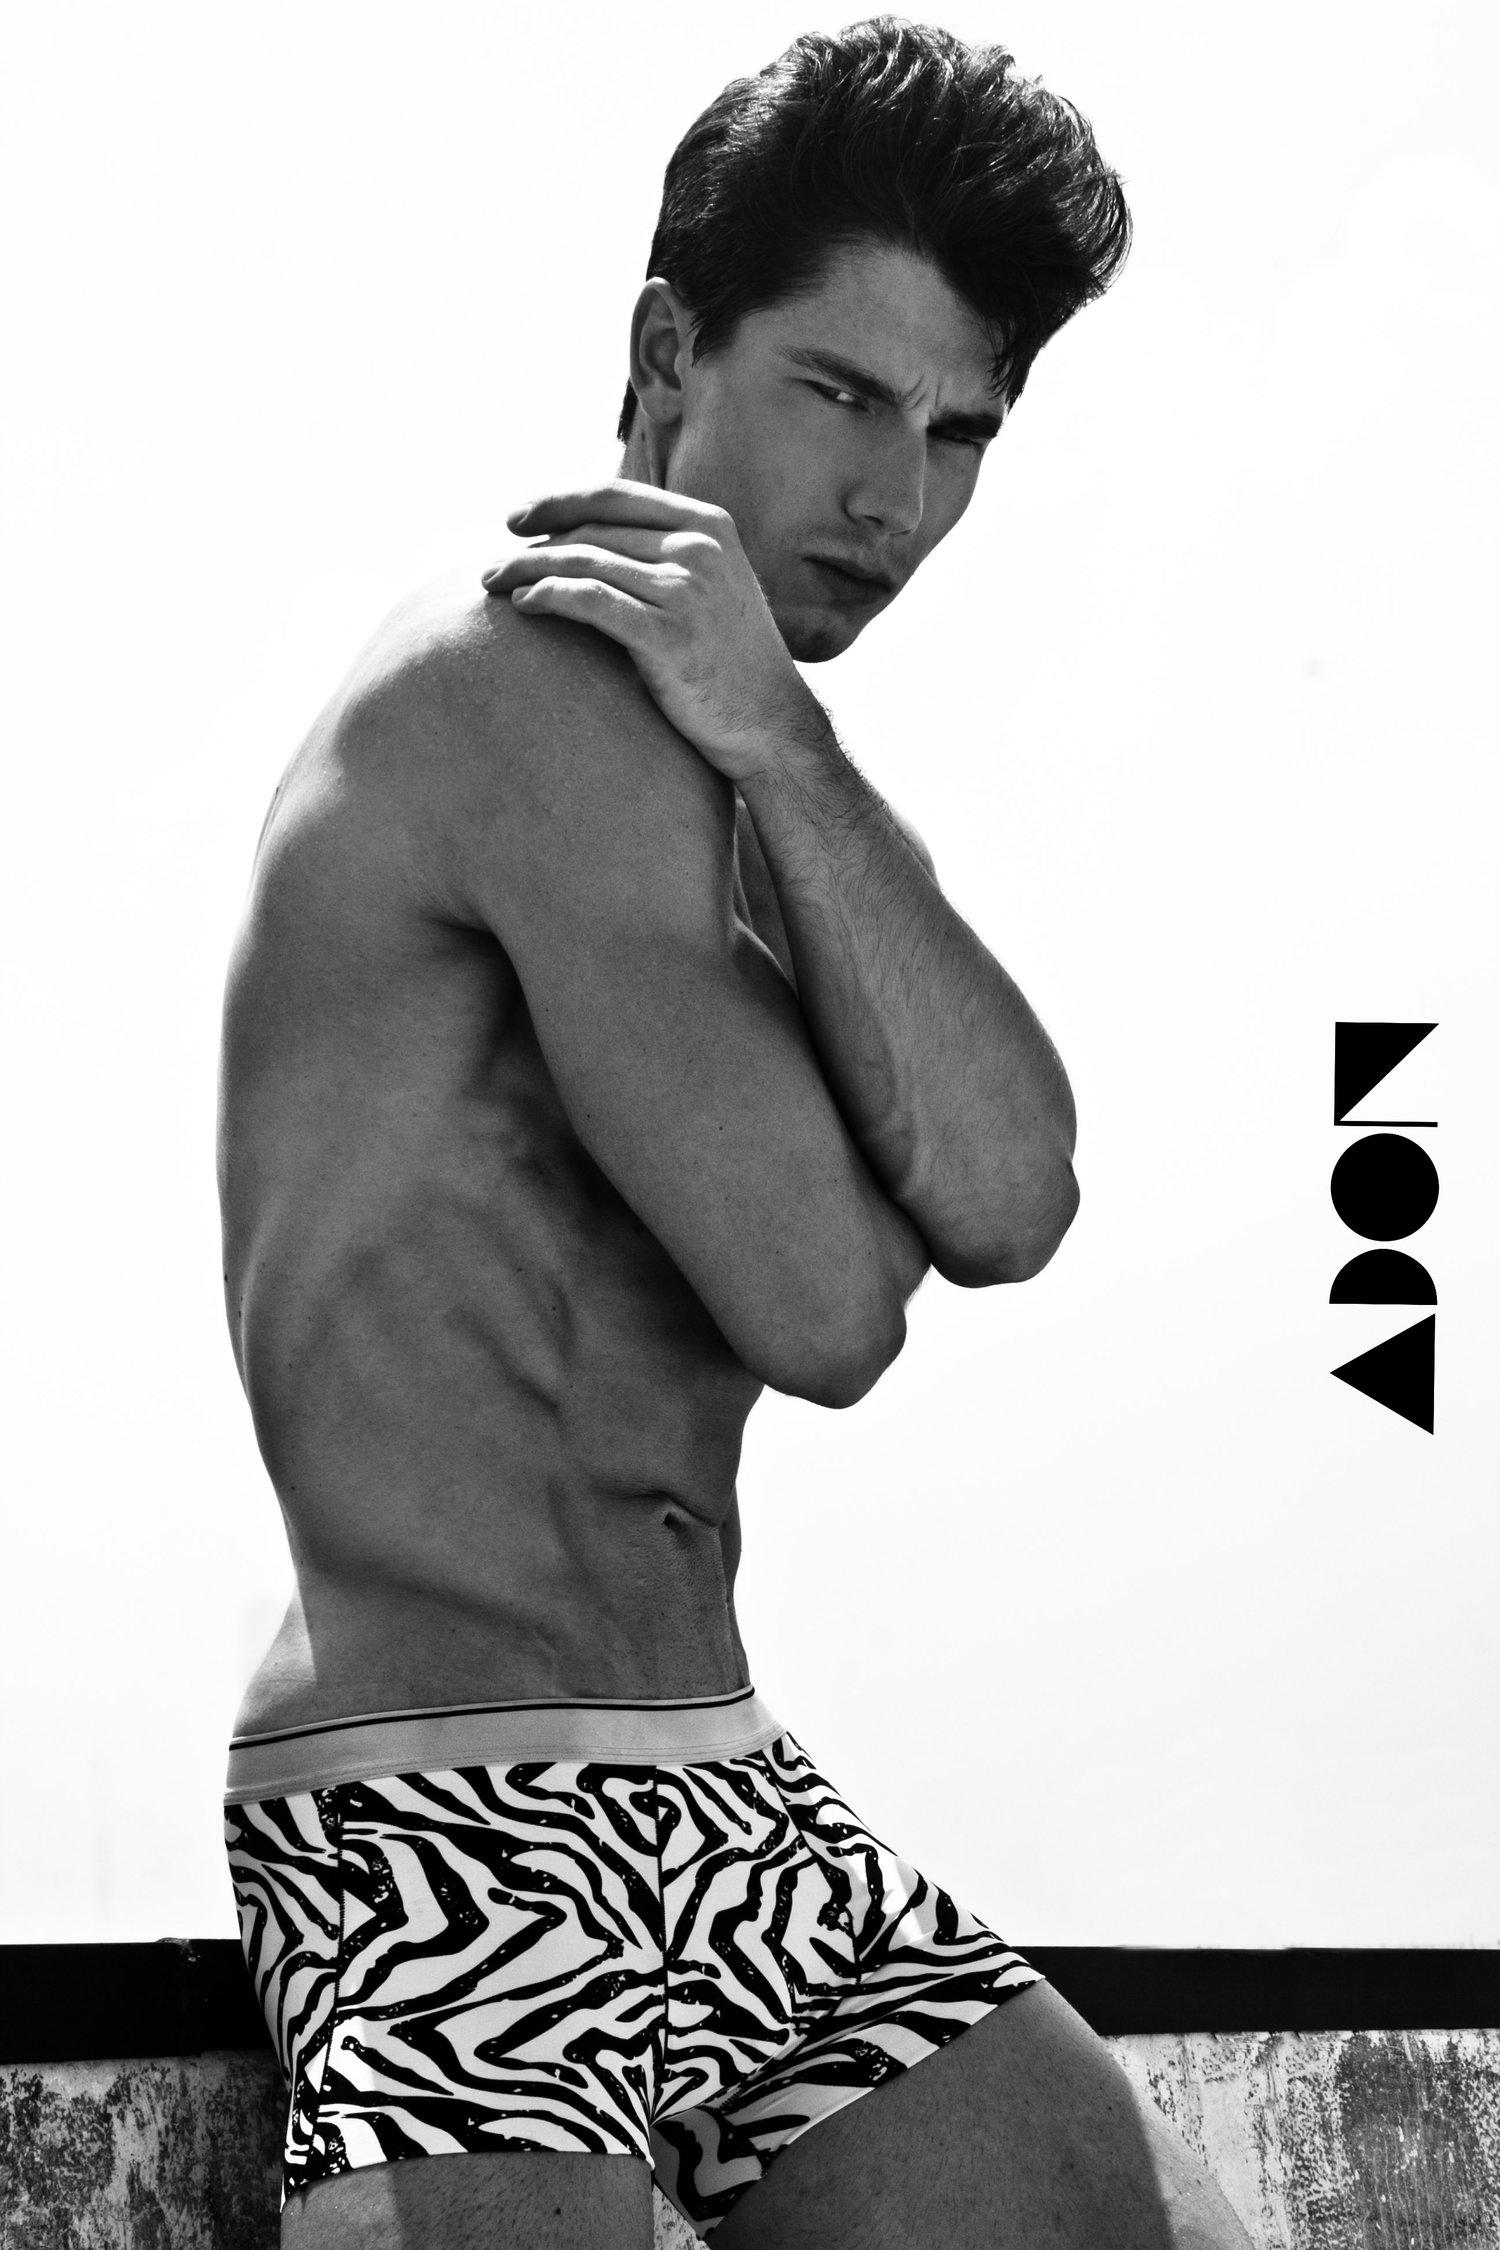 Adon Exclusive: Model Mitya Ku By Xram Ragde